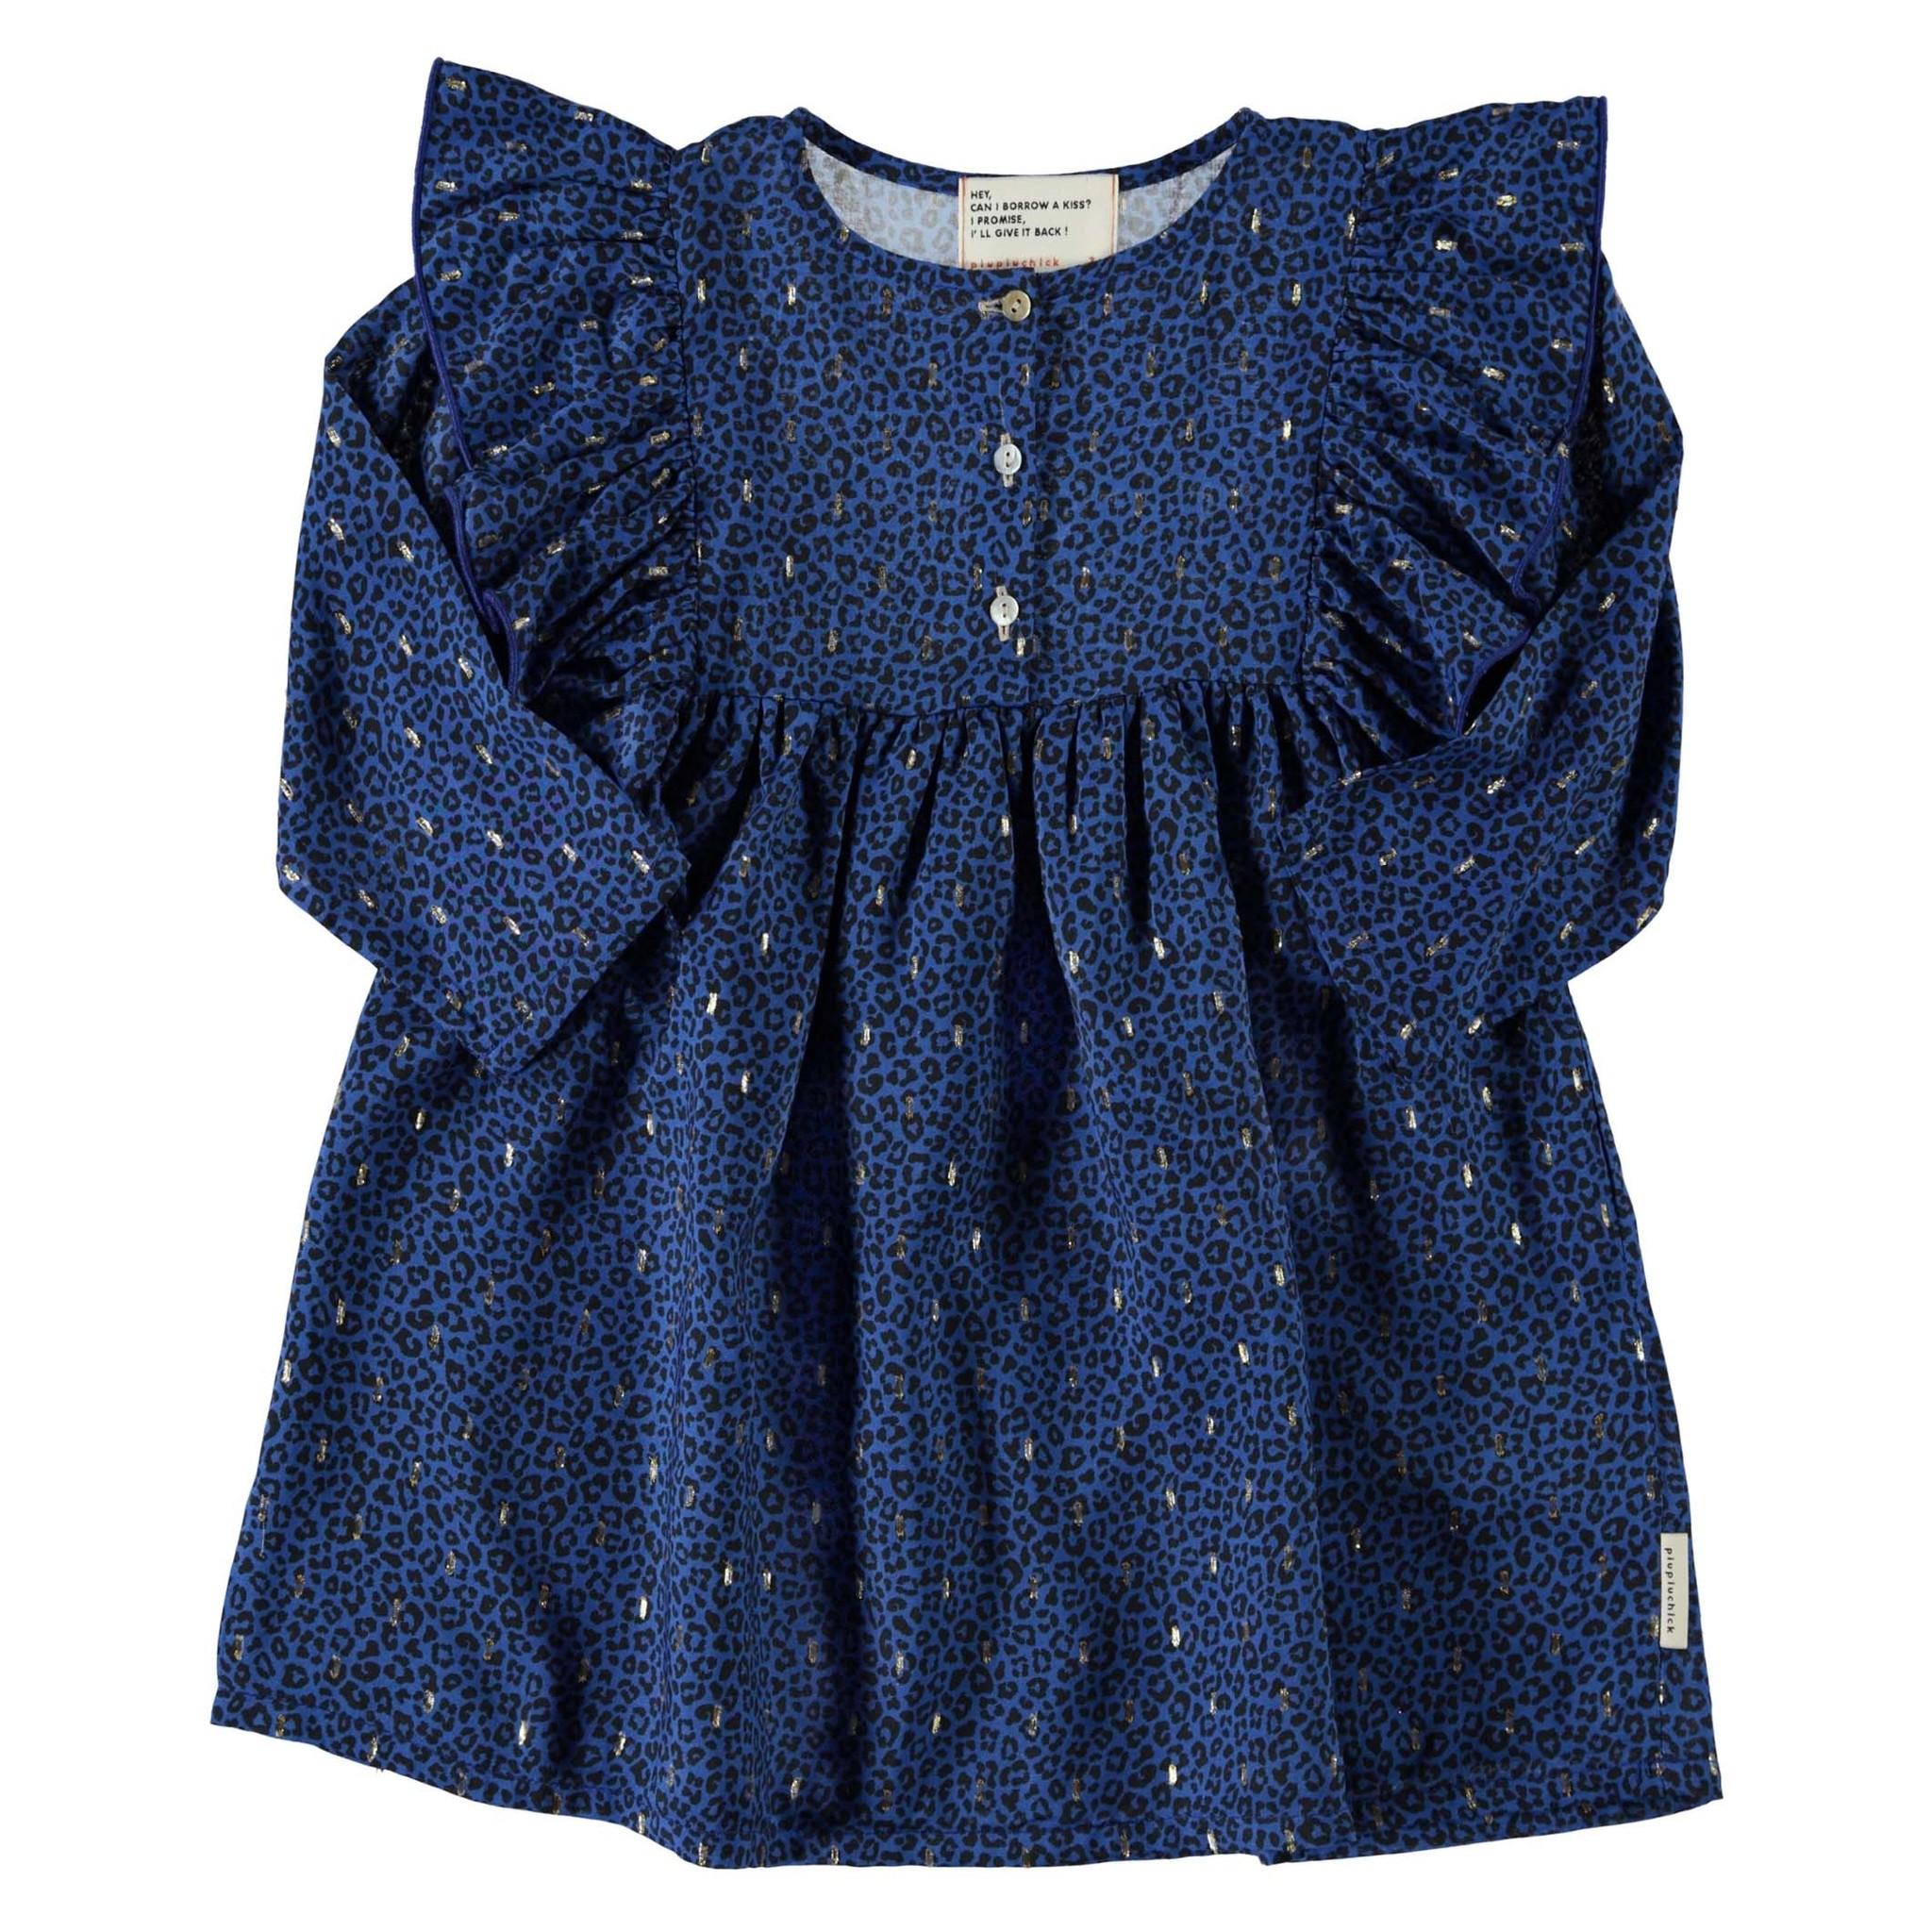 short dress w/ frills on shoulders | indigo animal print w/ golden lurex-1